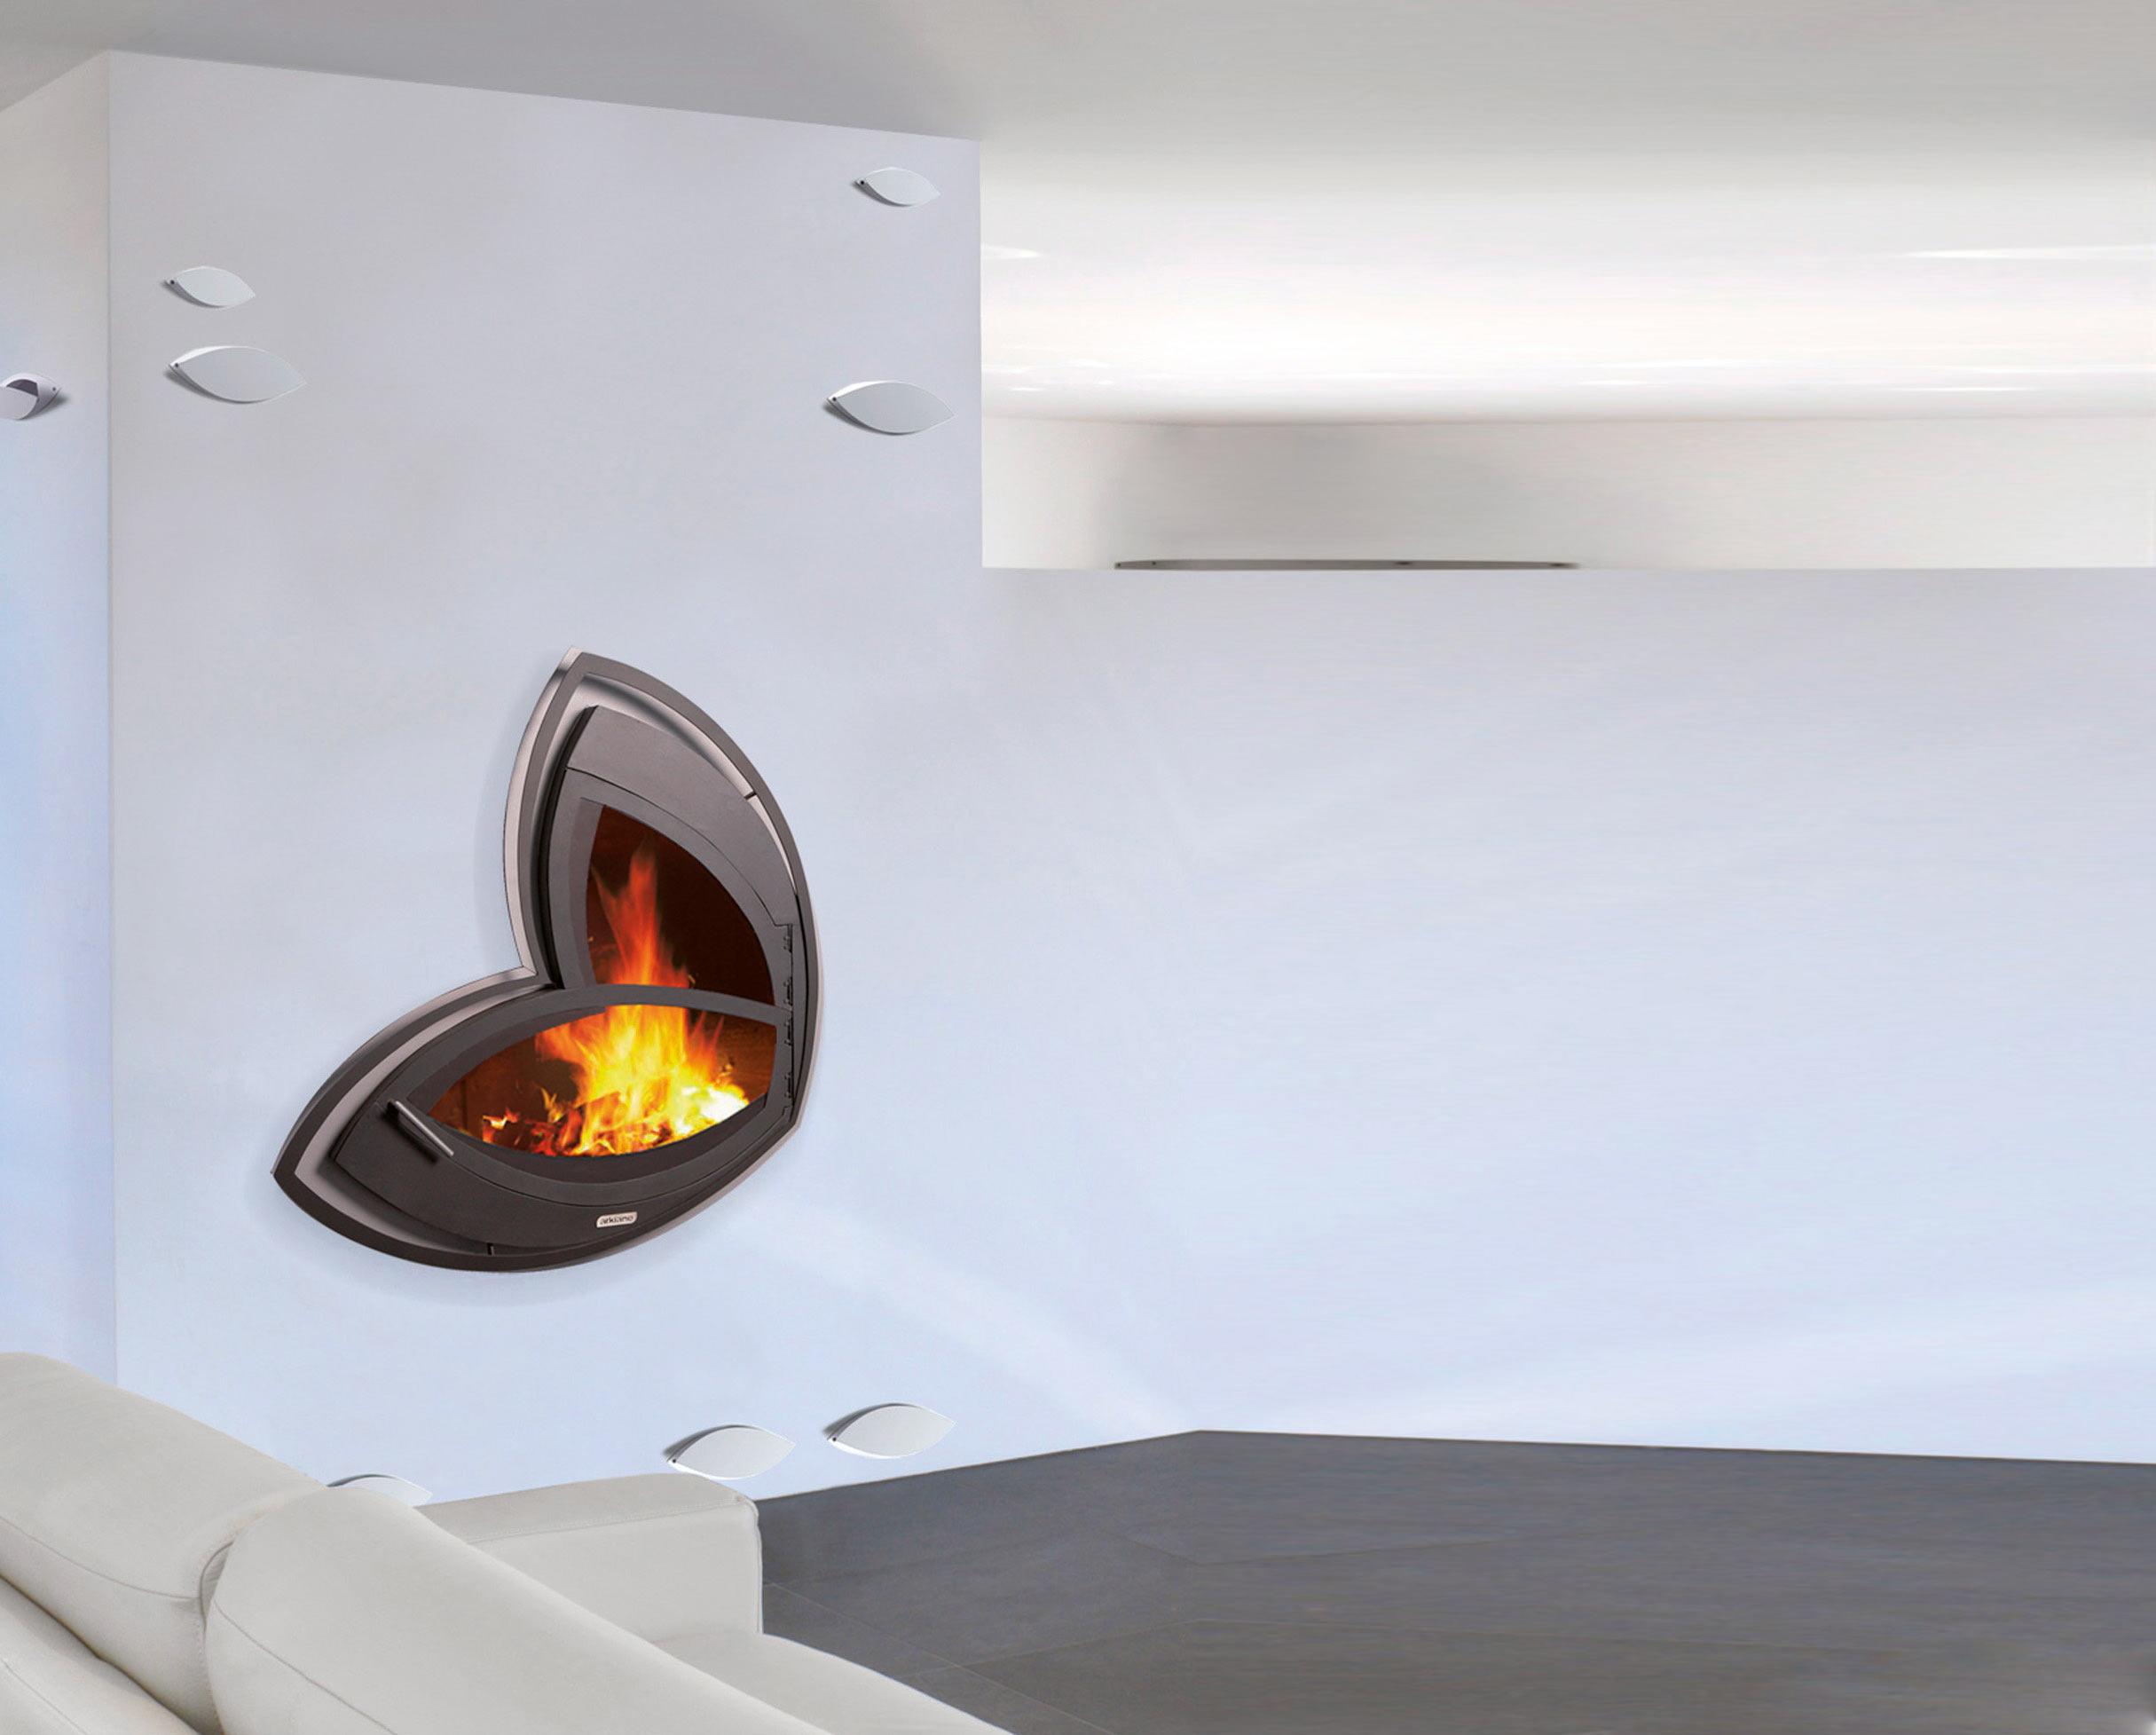 Flam nice cheminées originales Traforart